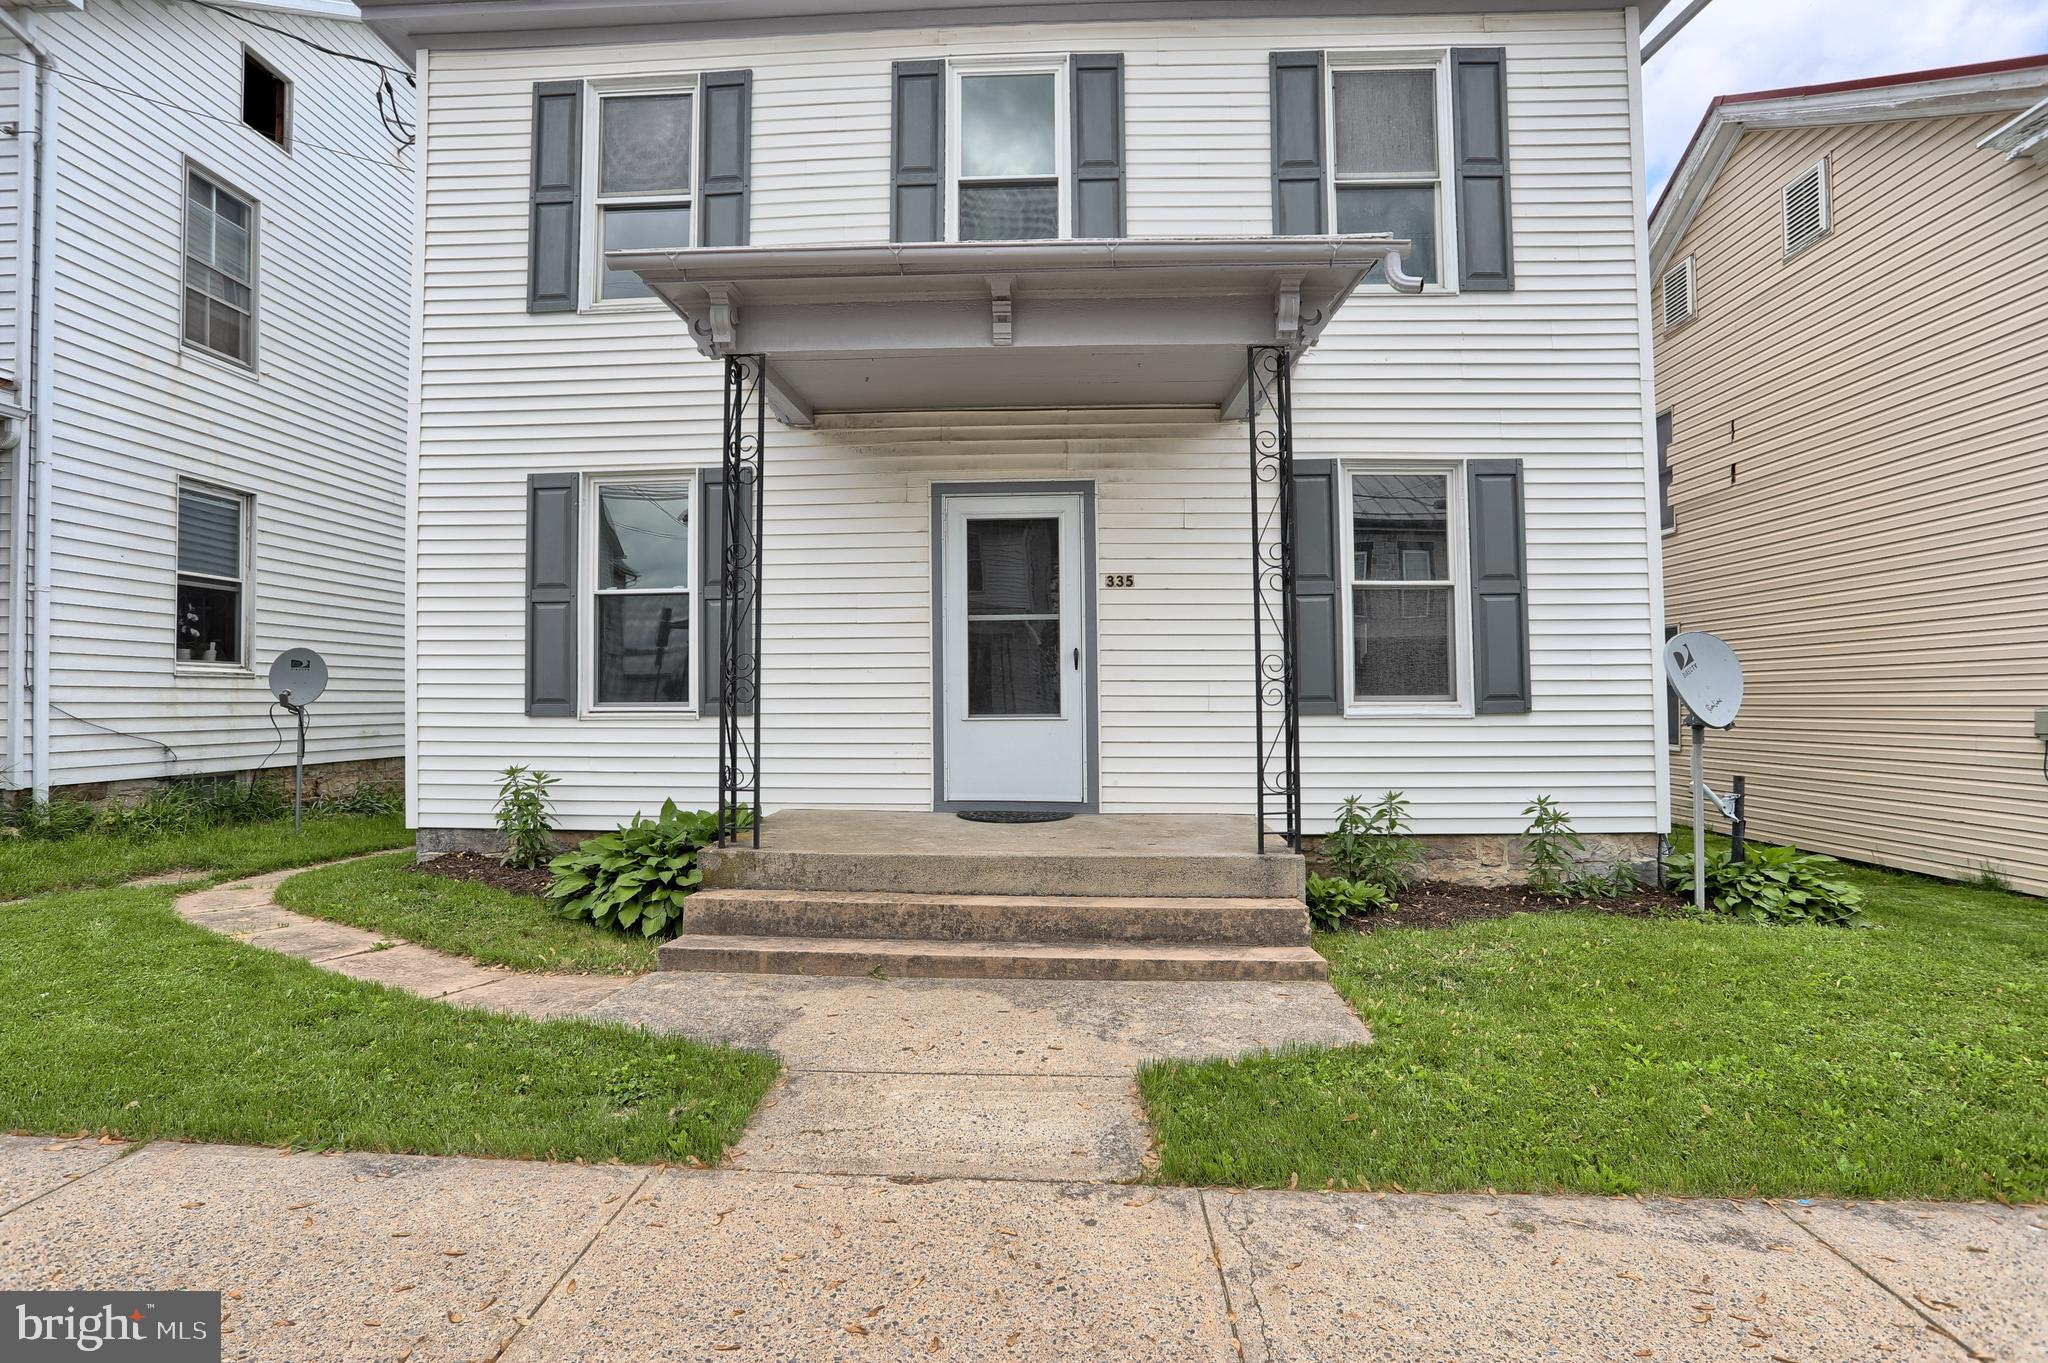 335 E MAIN STREET, BLAIN, PA 17006